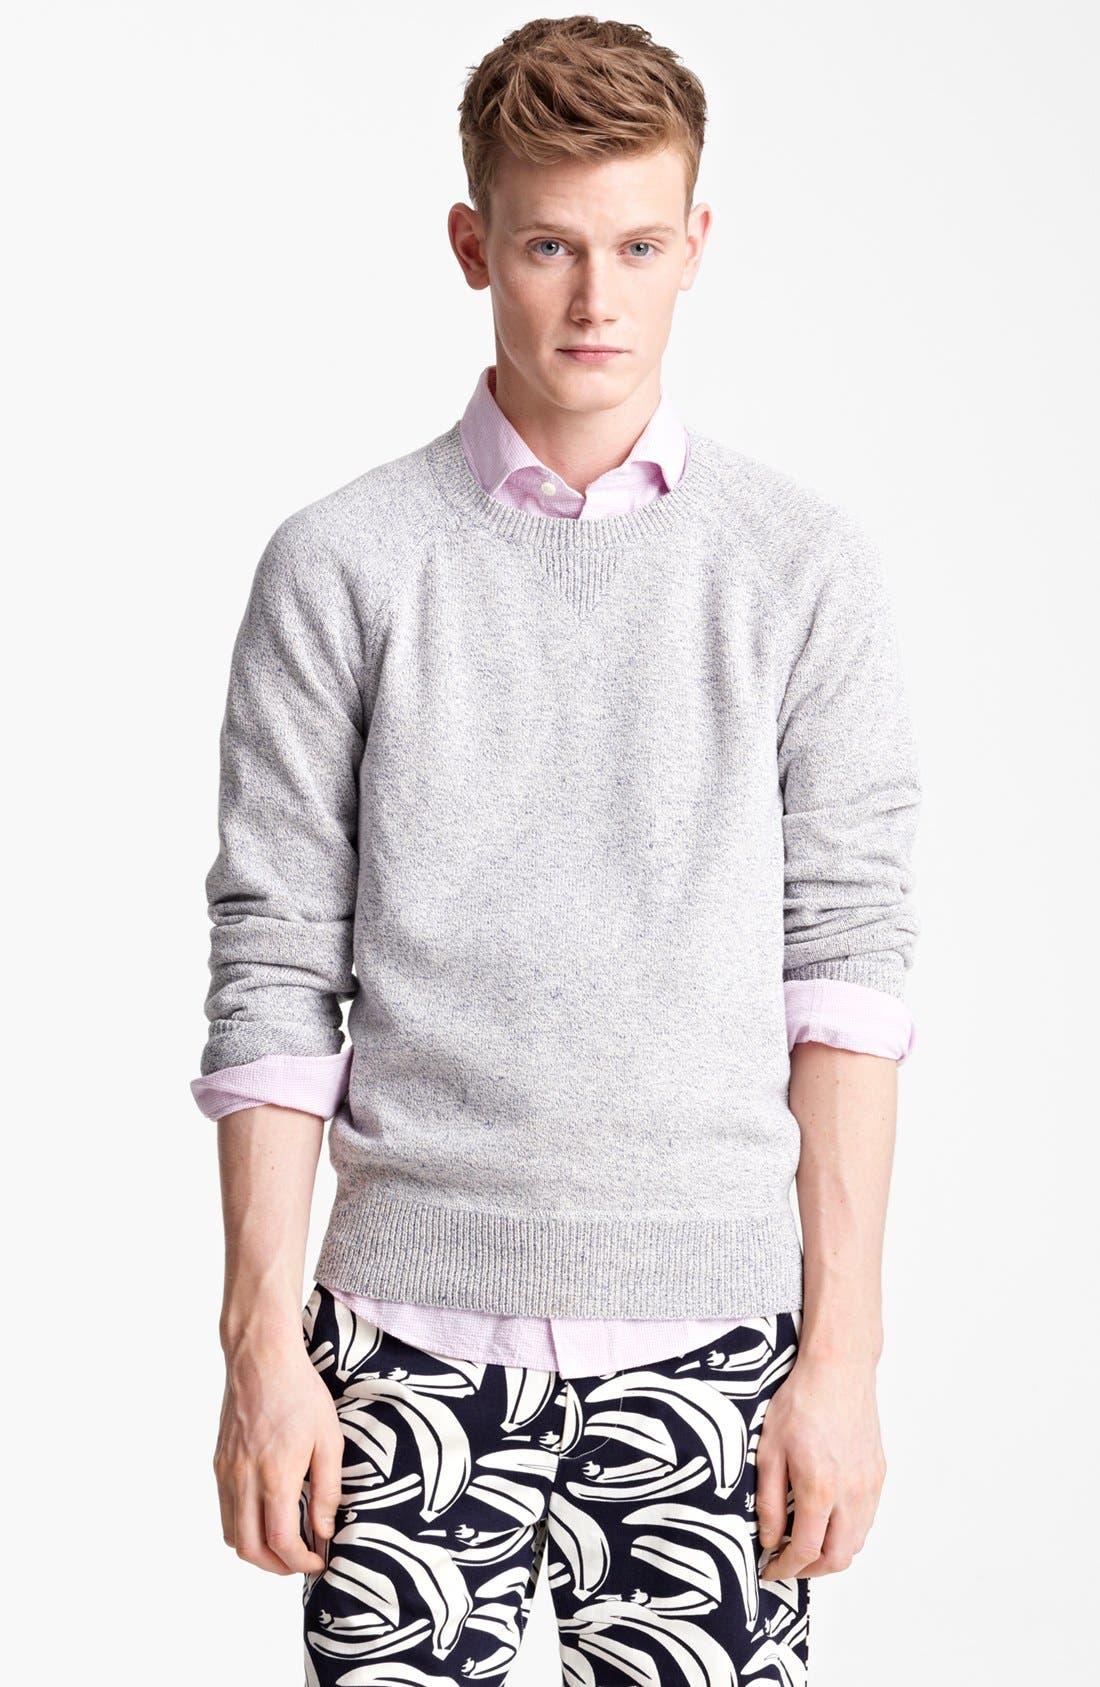 Main Image - Jack Spade 'Dawson' Cotton & Linen Crewneck Sweater